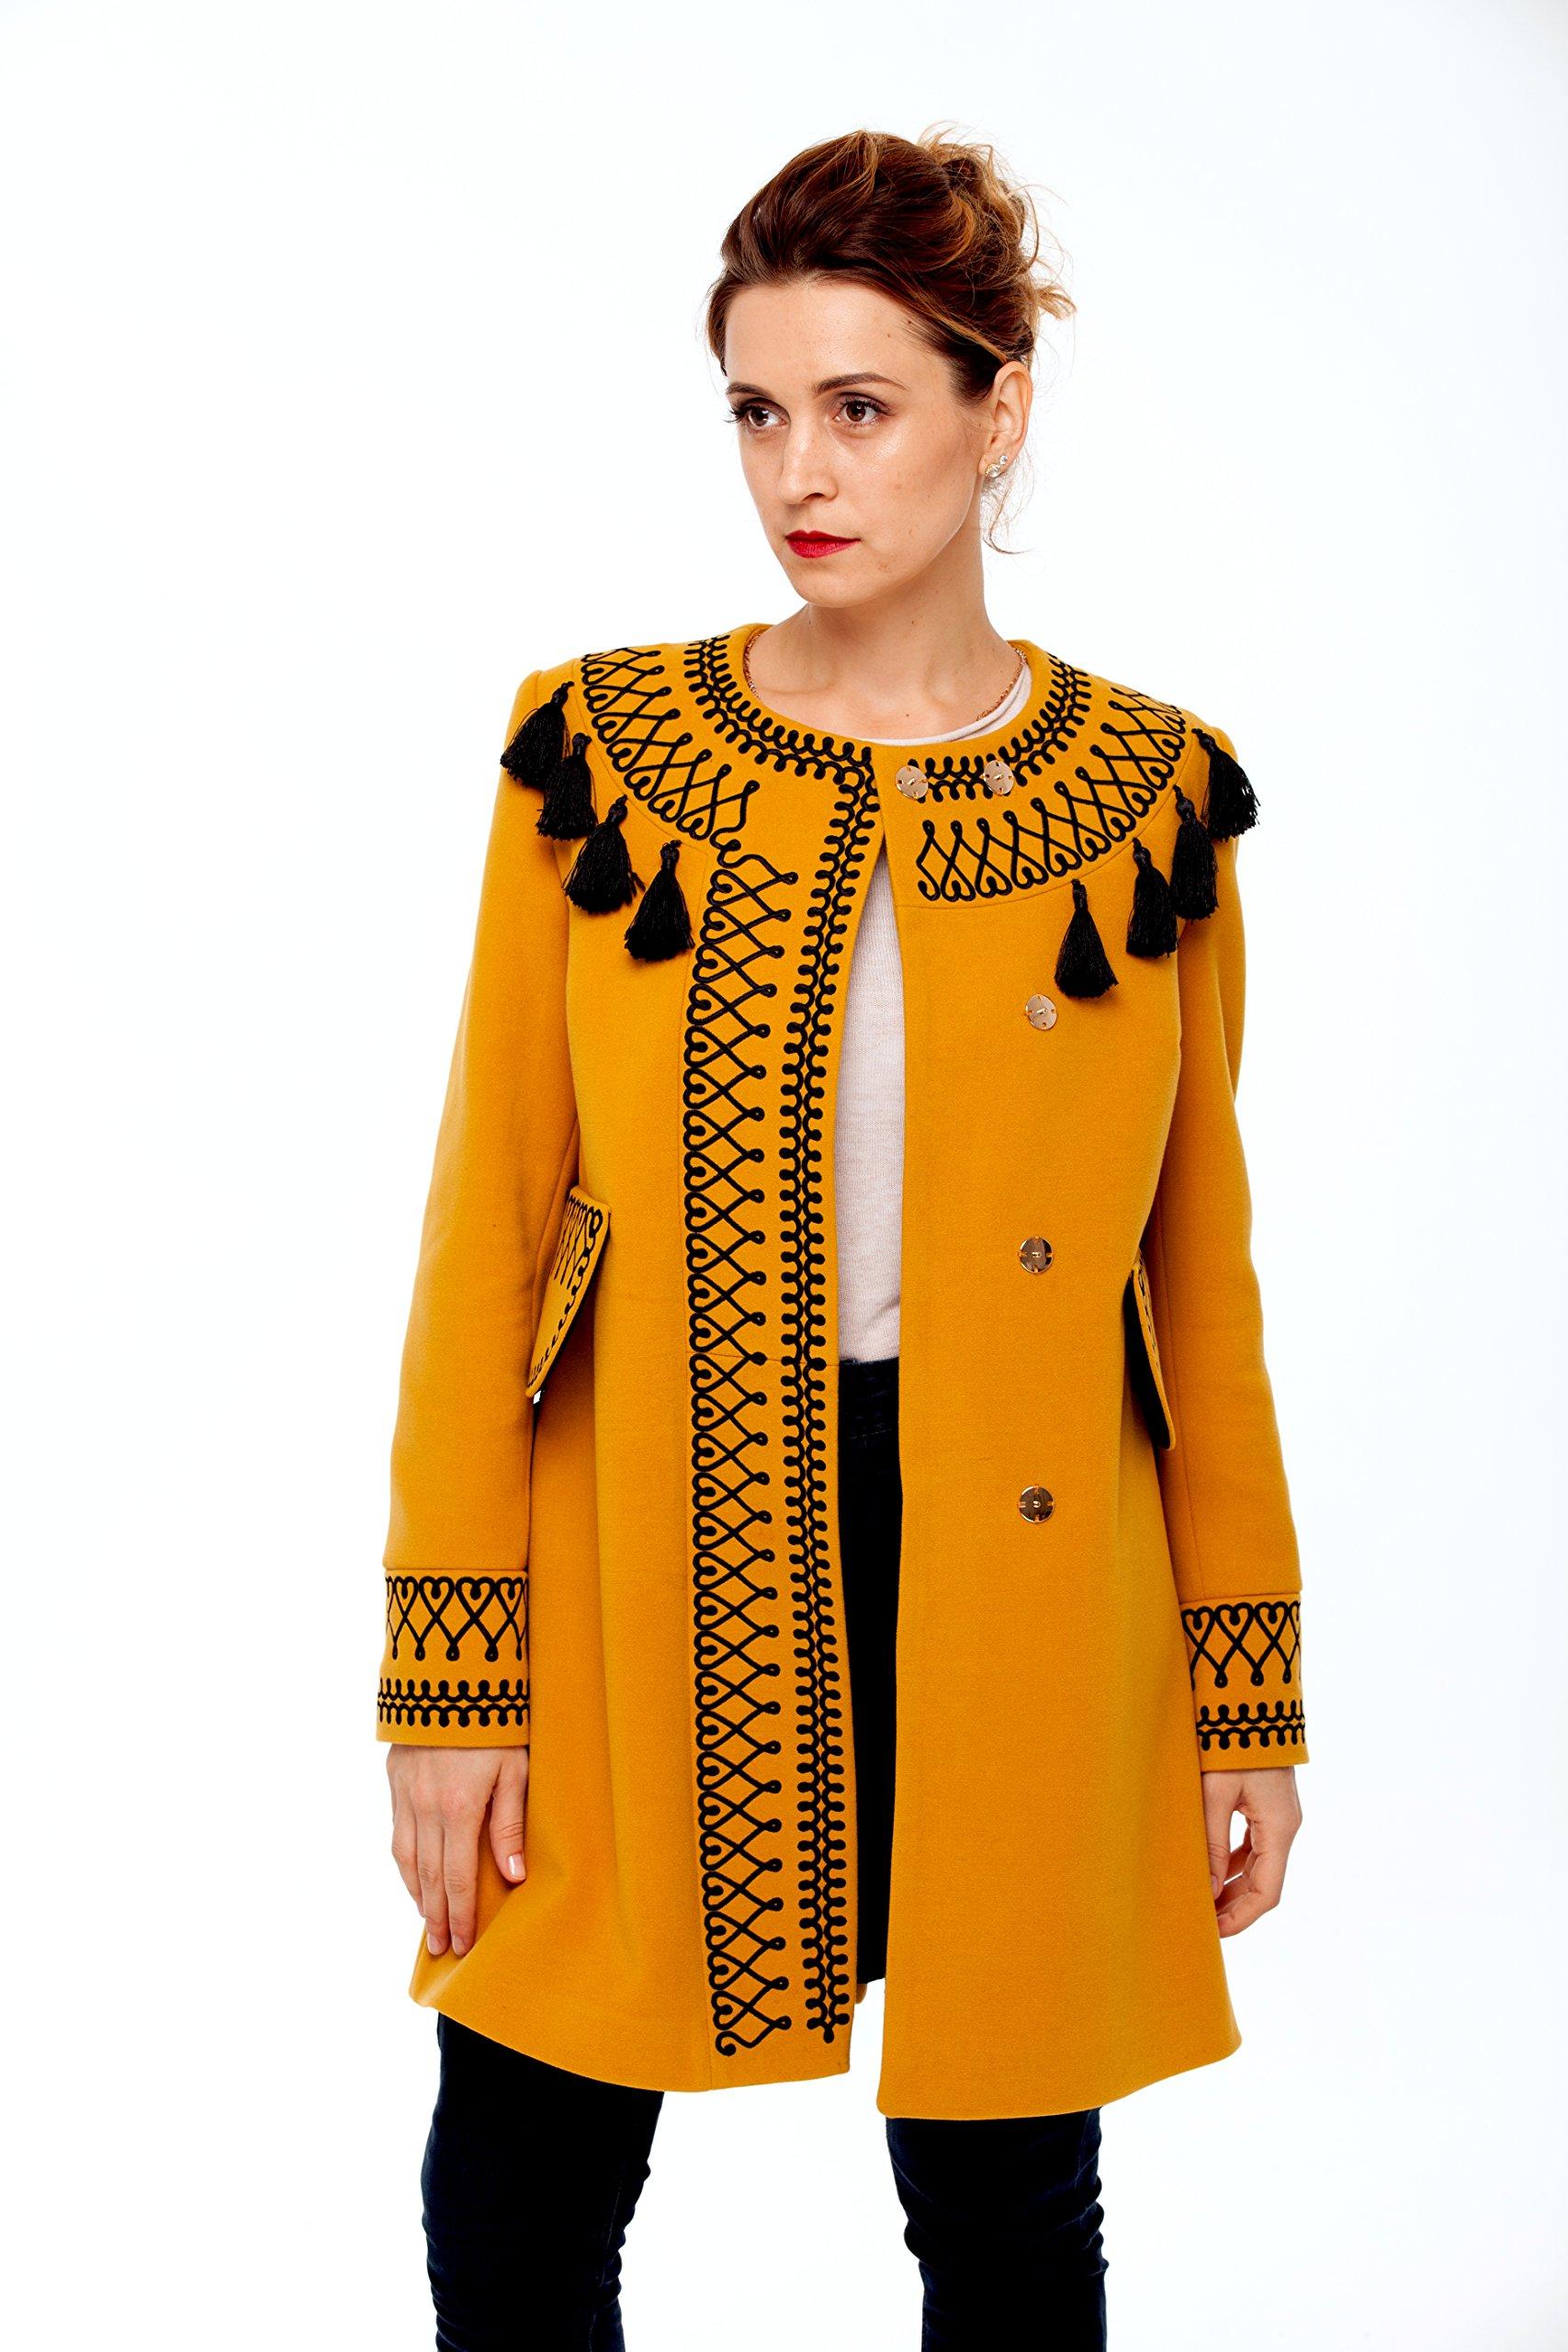 Women Designer Coats With Tassels Ocher! Embroidered Boho Style Coat! (M/L)